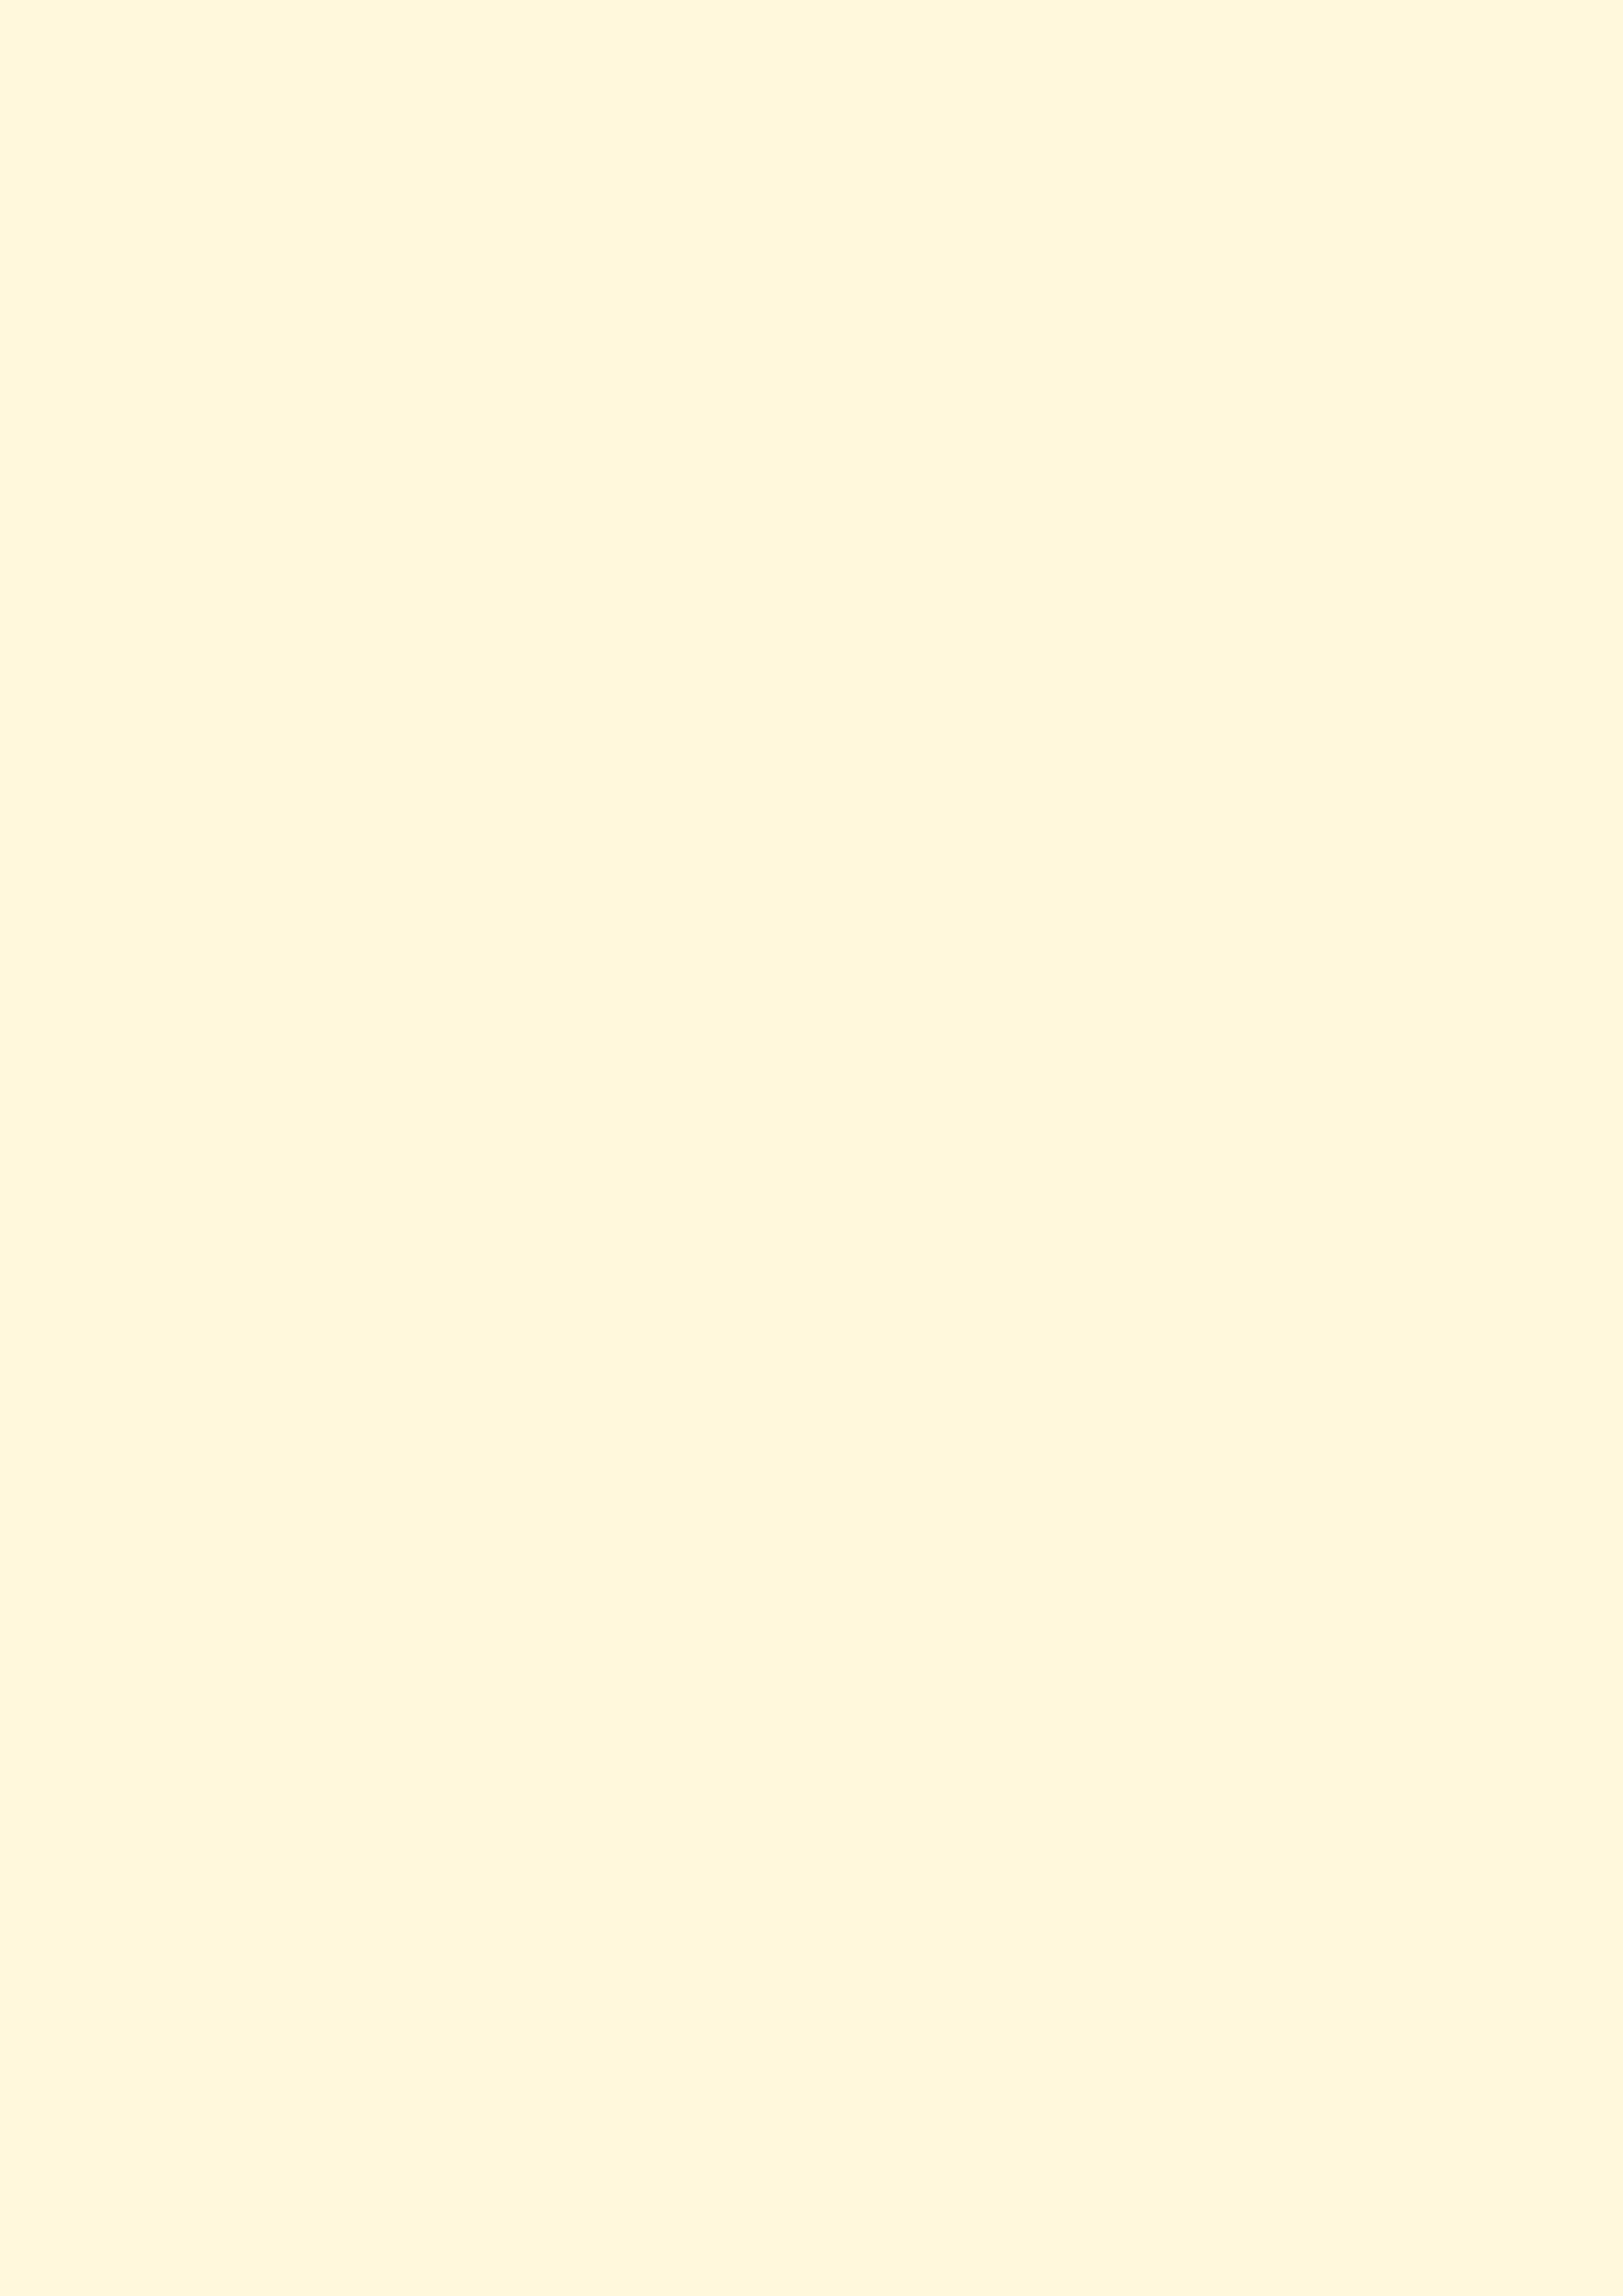 2480x3508 Cornsilk Solid Color Background